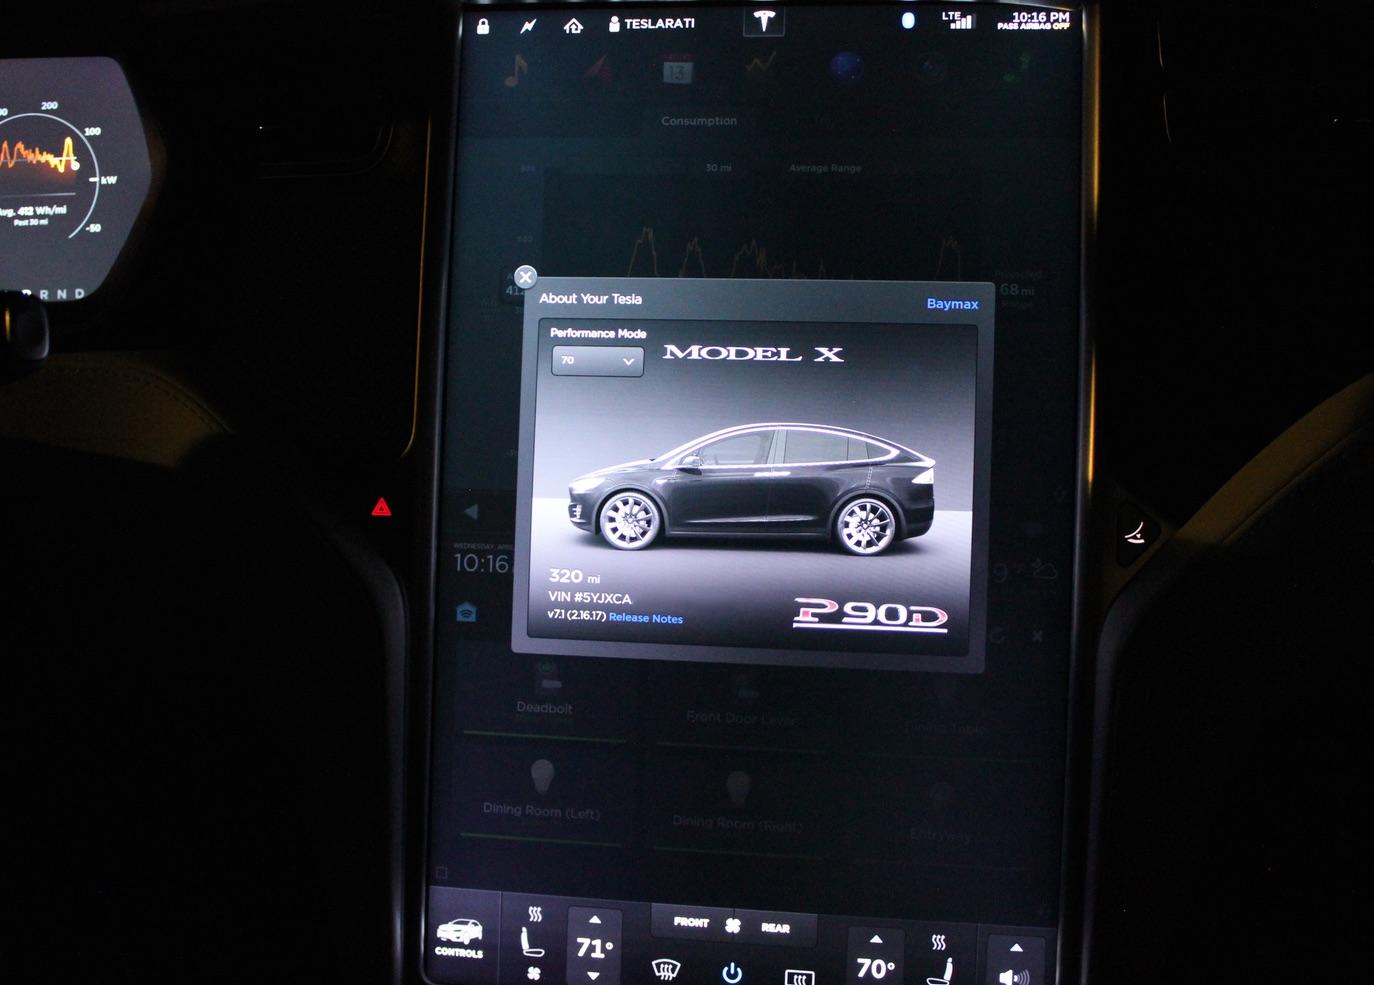 Tesla-Performance-Mode-Easter-Egg-3-Touchscreen